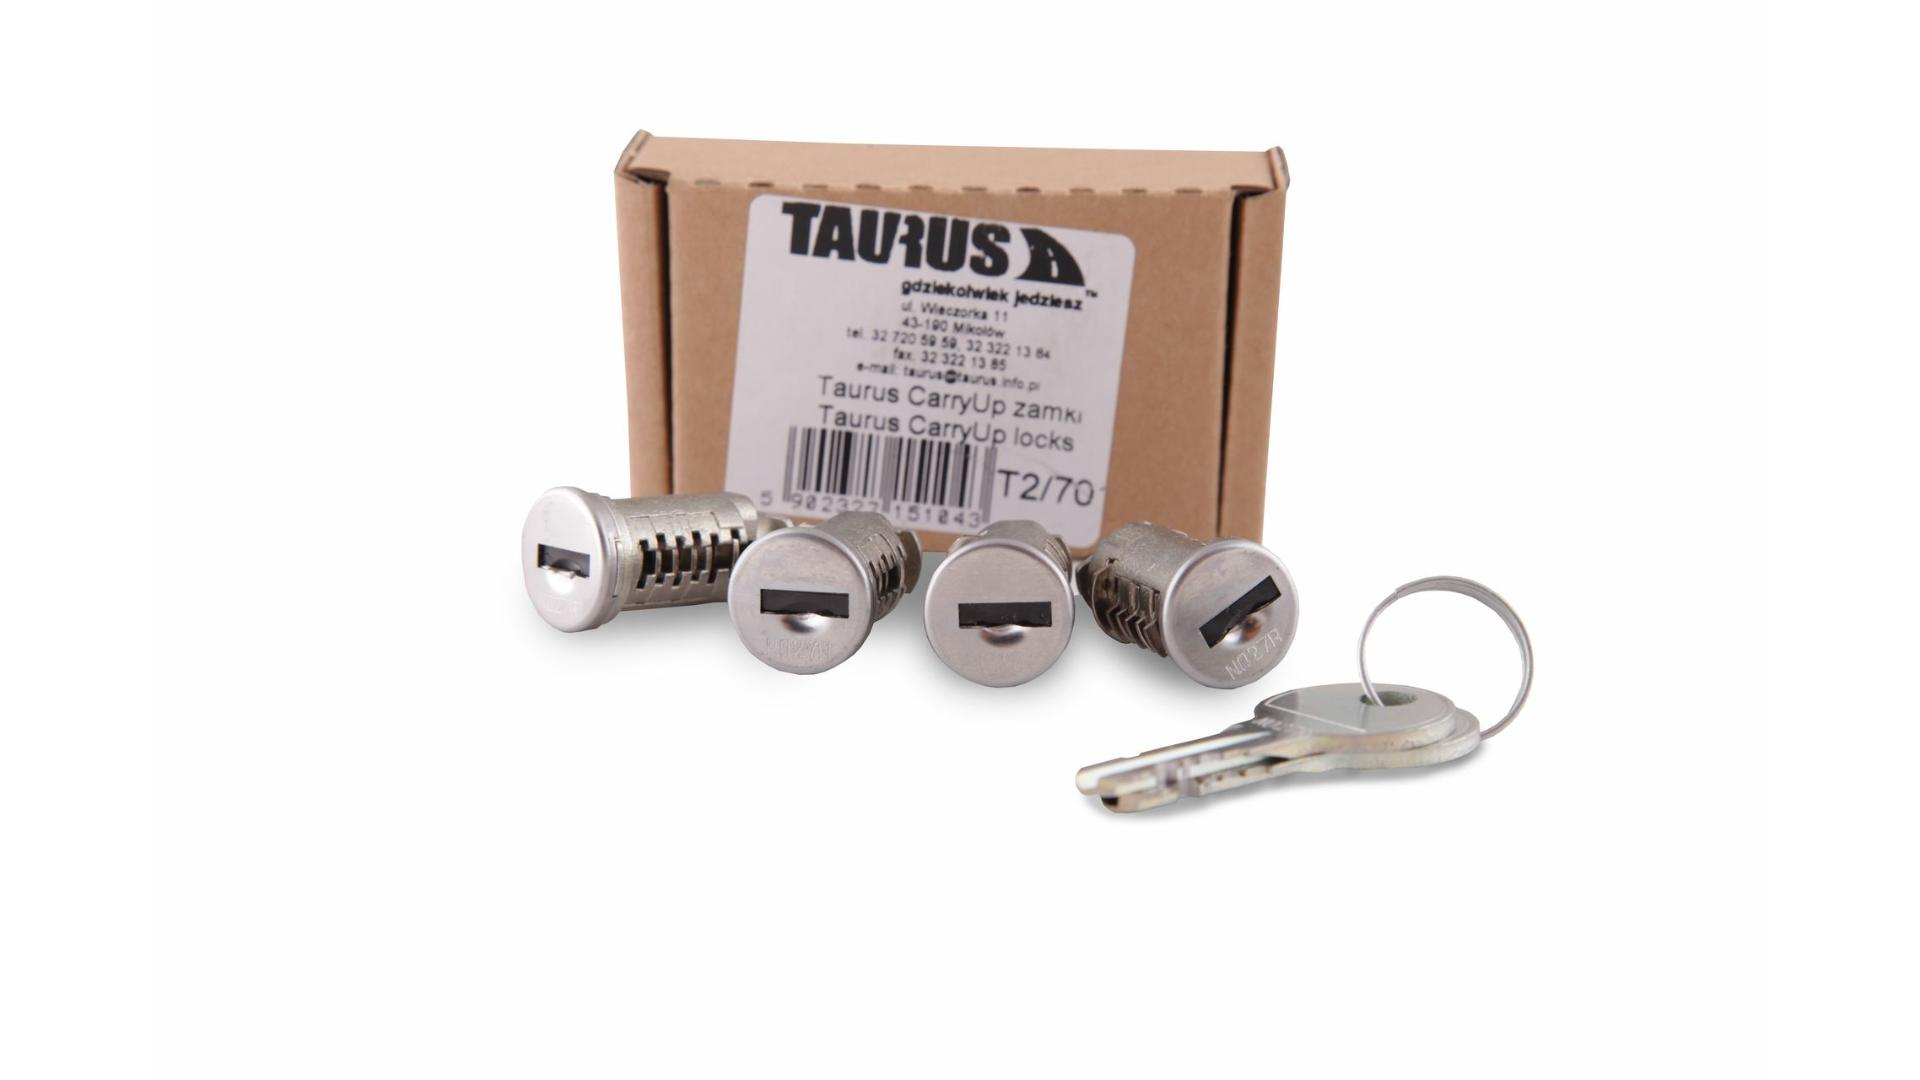 Taurus CarryUp zámok